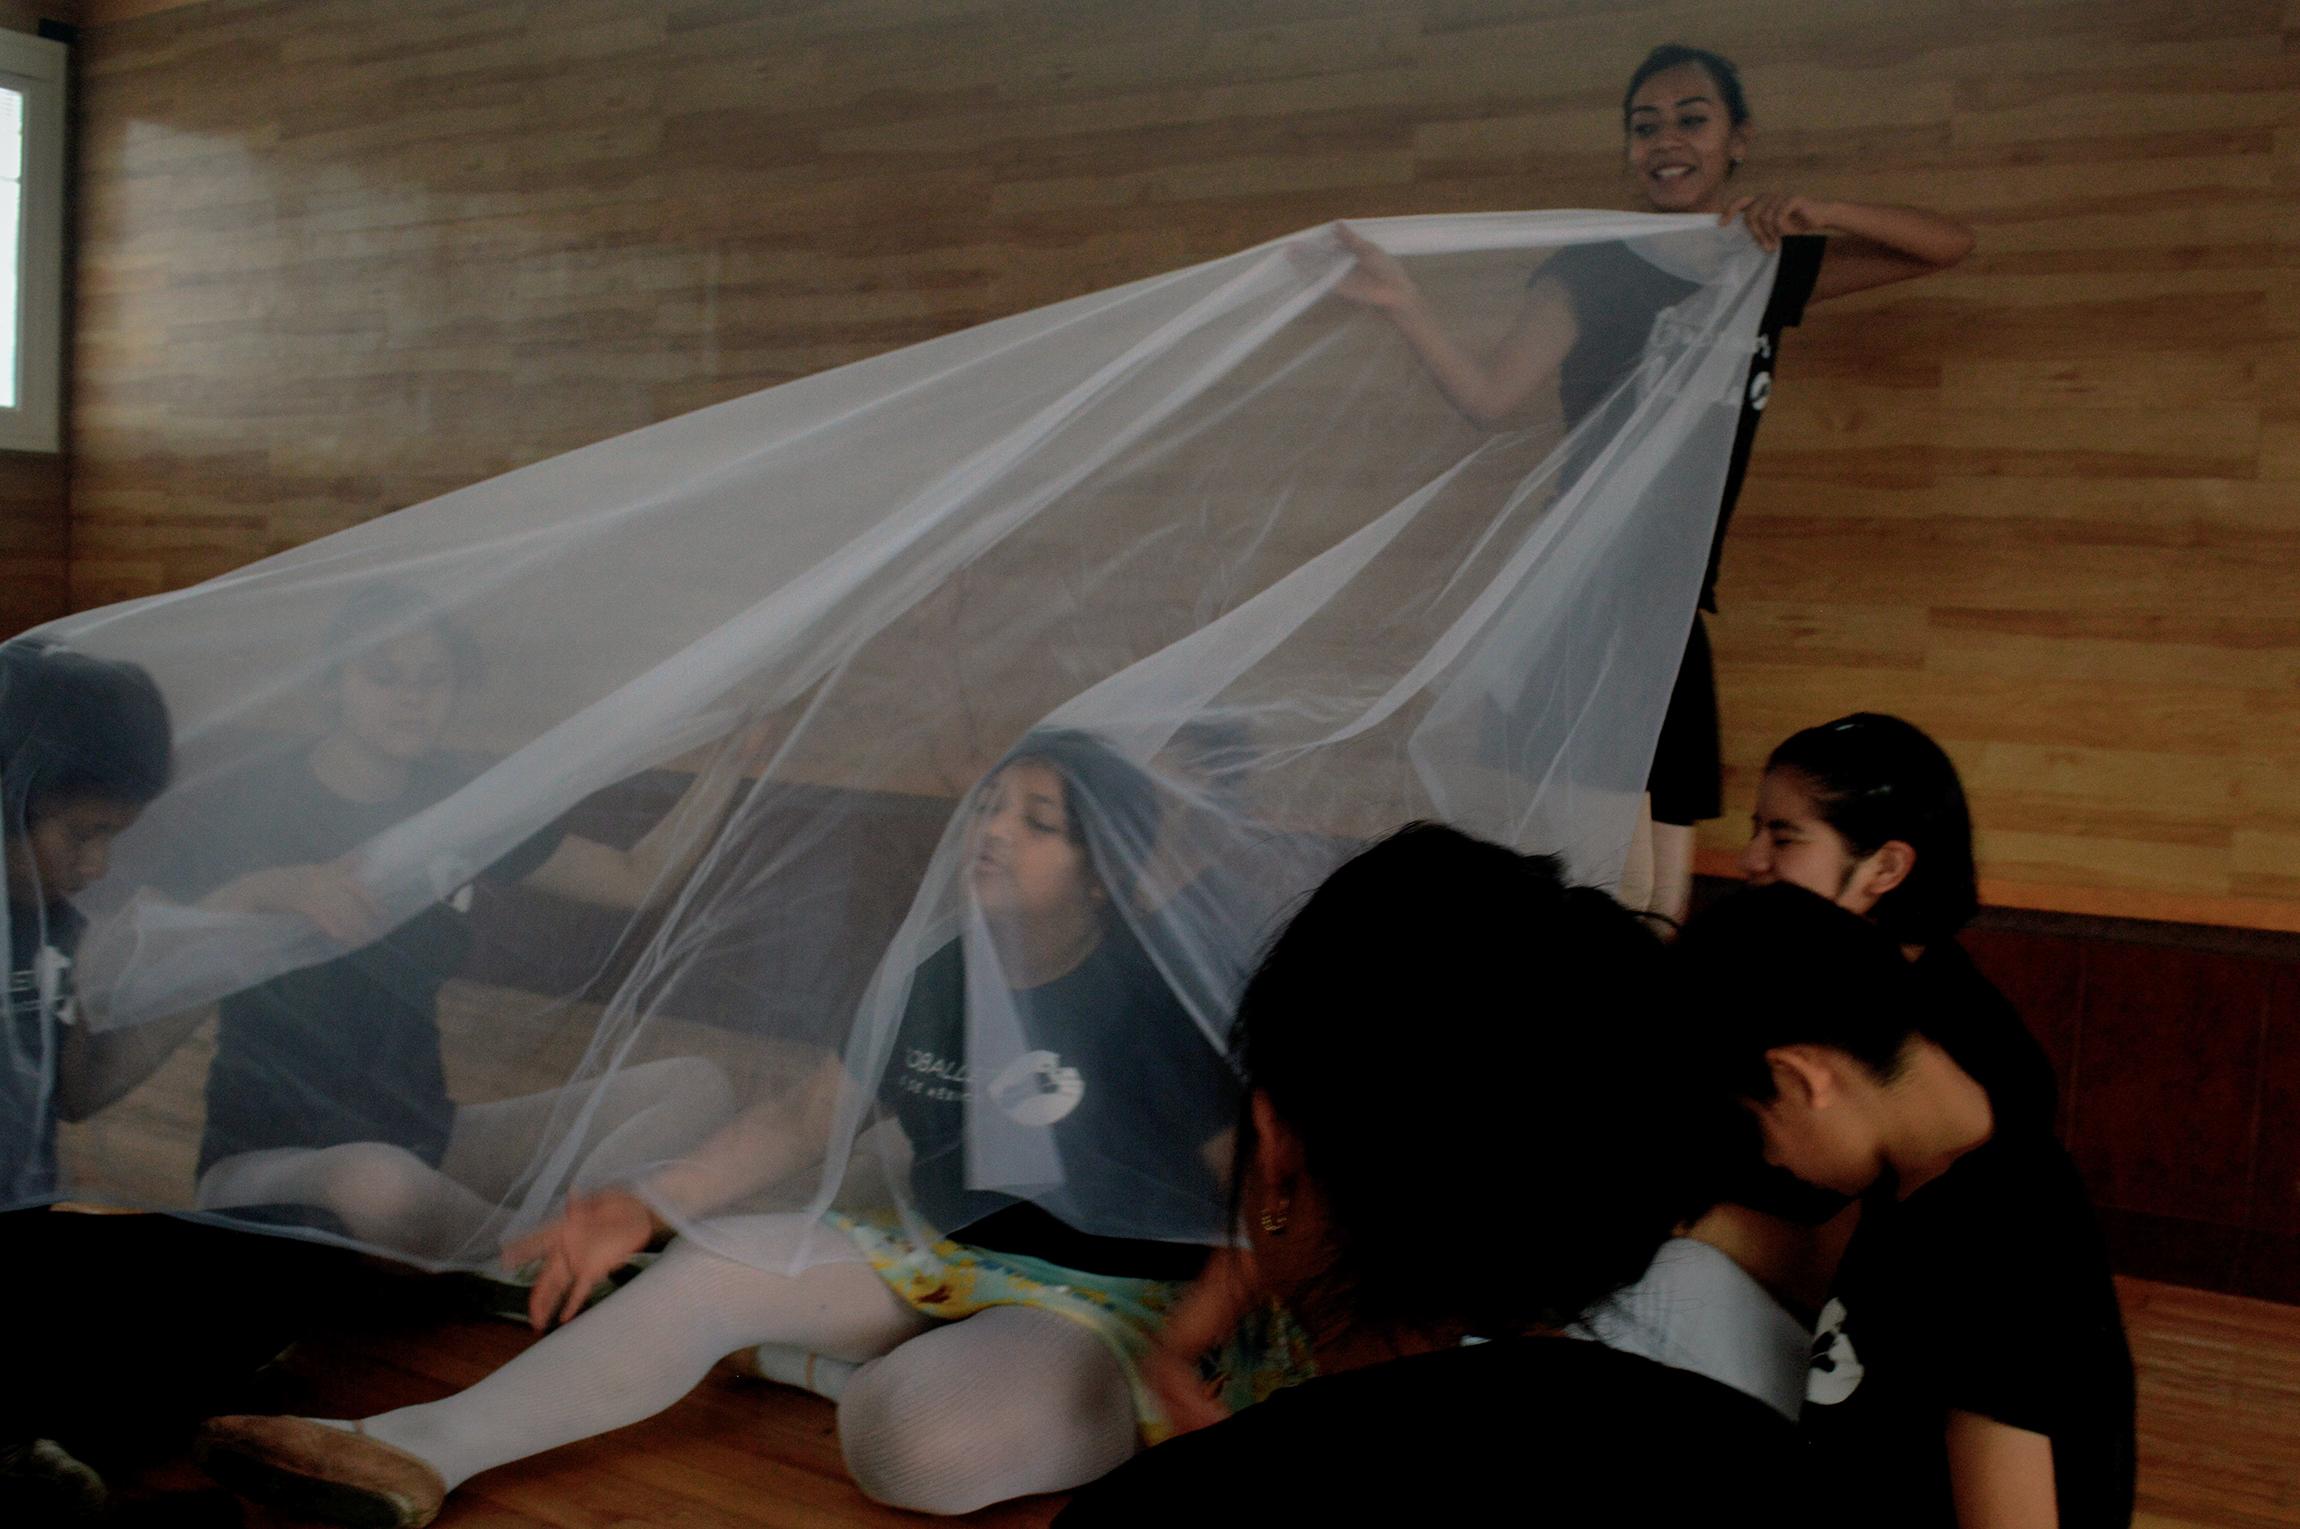 Teacher Lorena Nieva uses translucent fabric in an improvisation